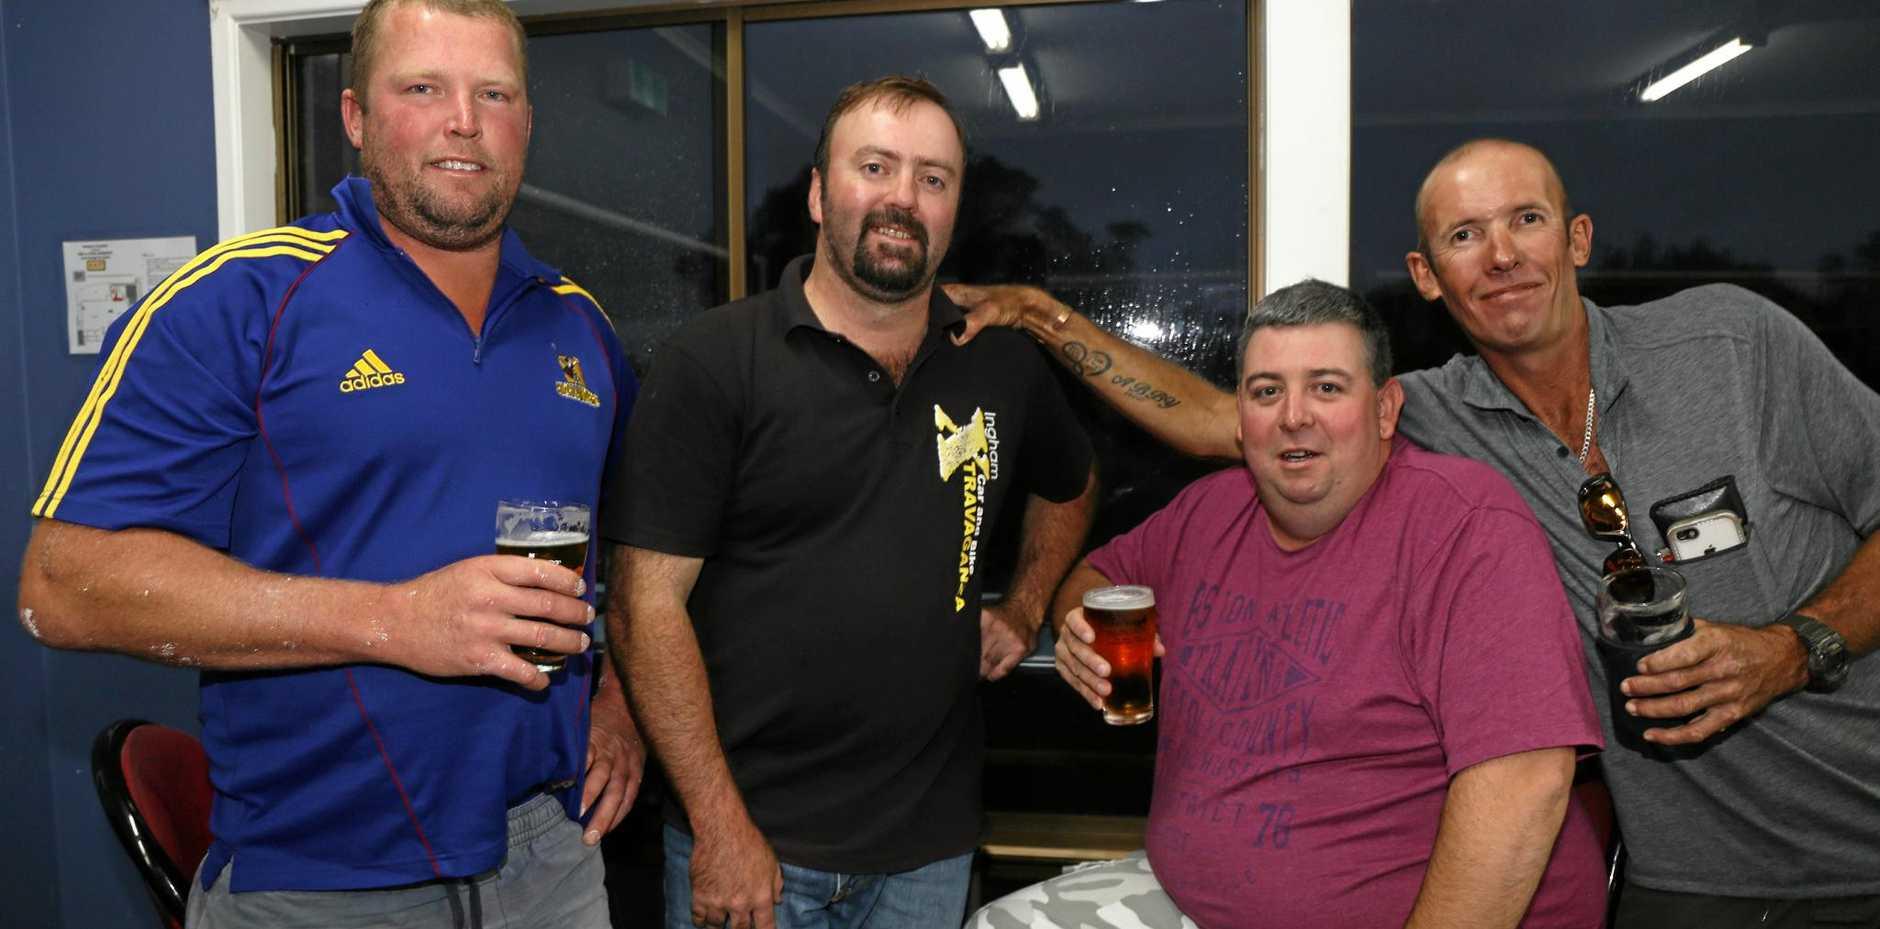 Scott Beard, Ross Hemmings, Justin Brickley and Shaun Morrison from Muzza's XI.